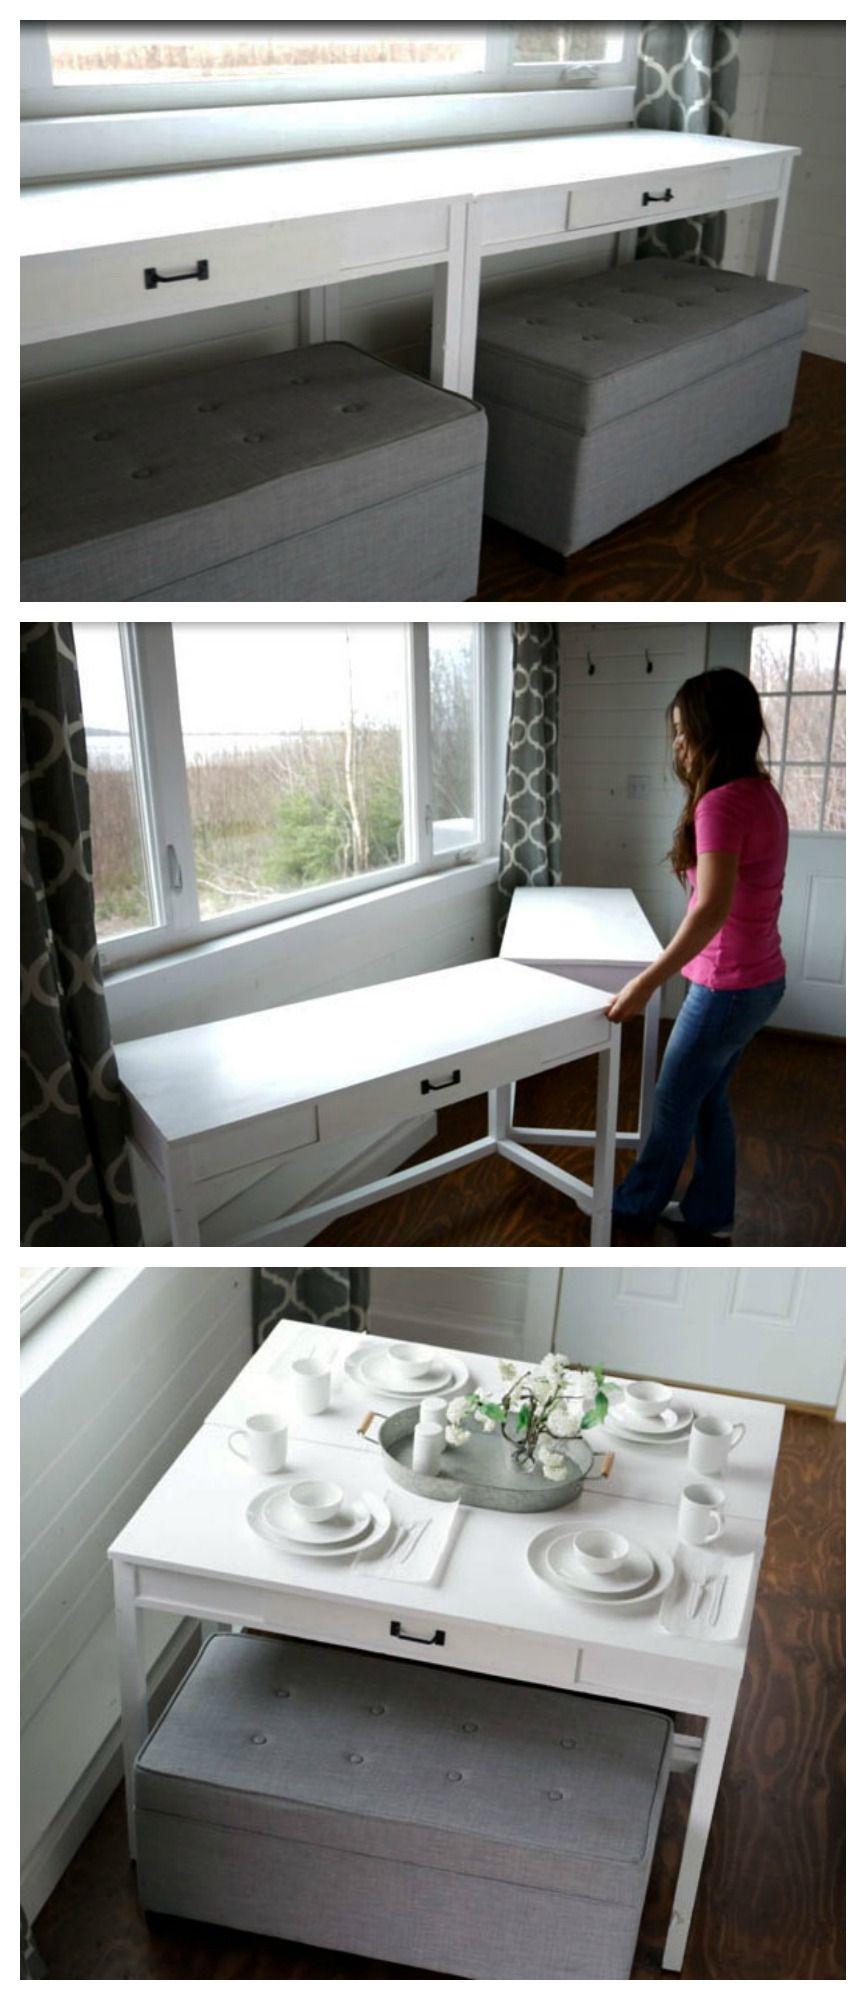 DIY Convertible DeskSpace Saving Idea Tiny houses